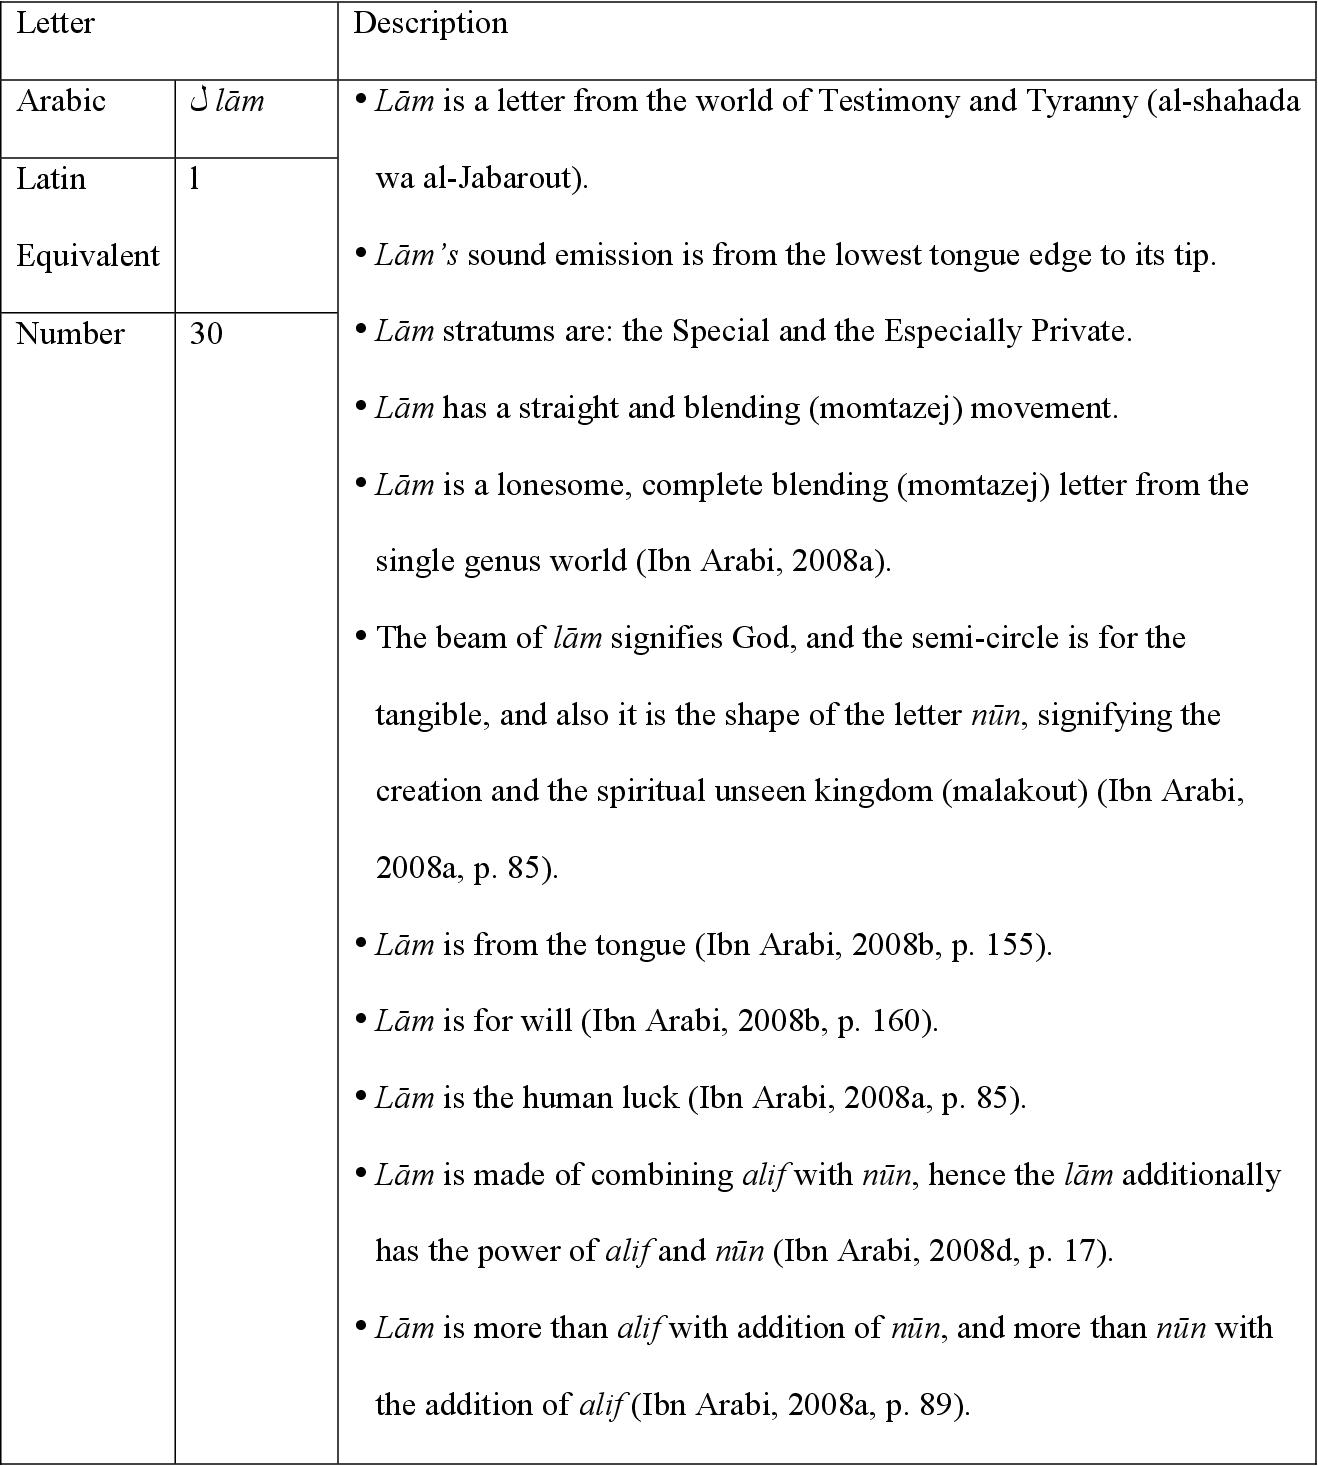 table B.24